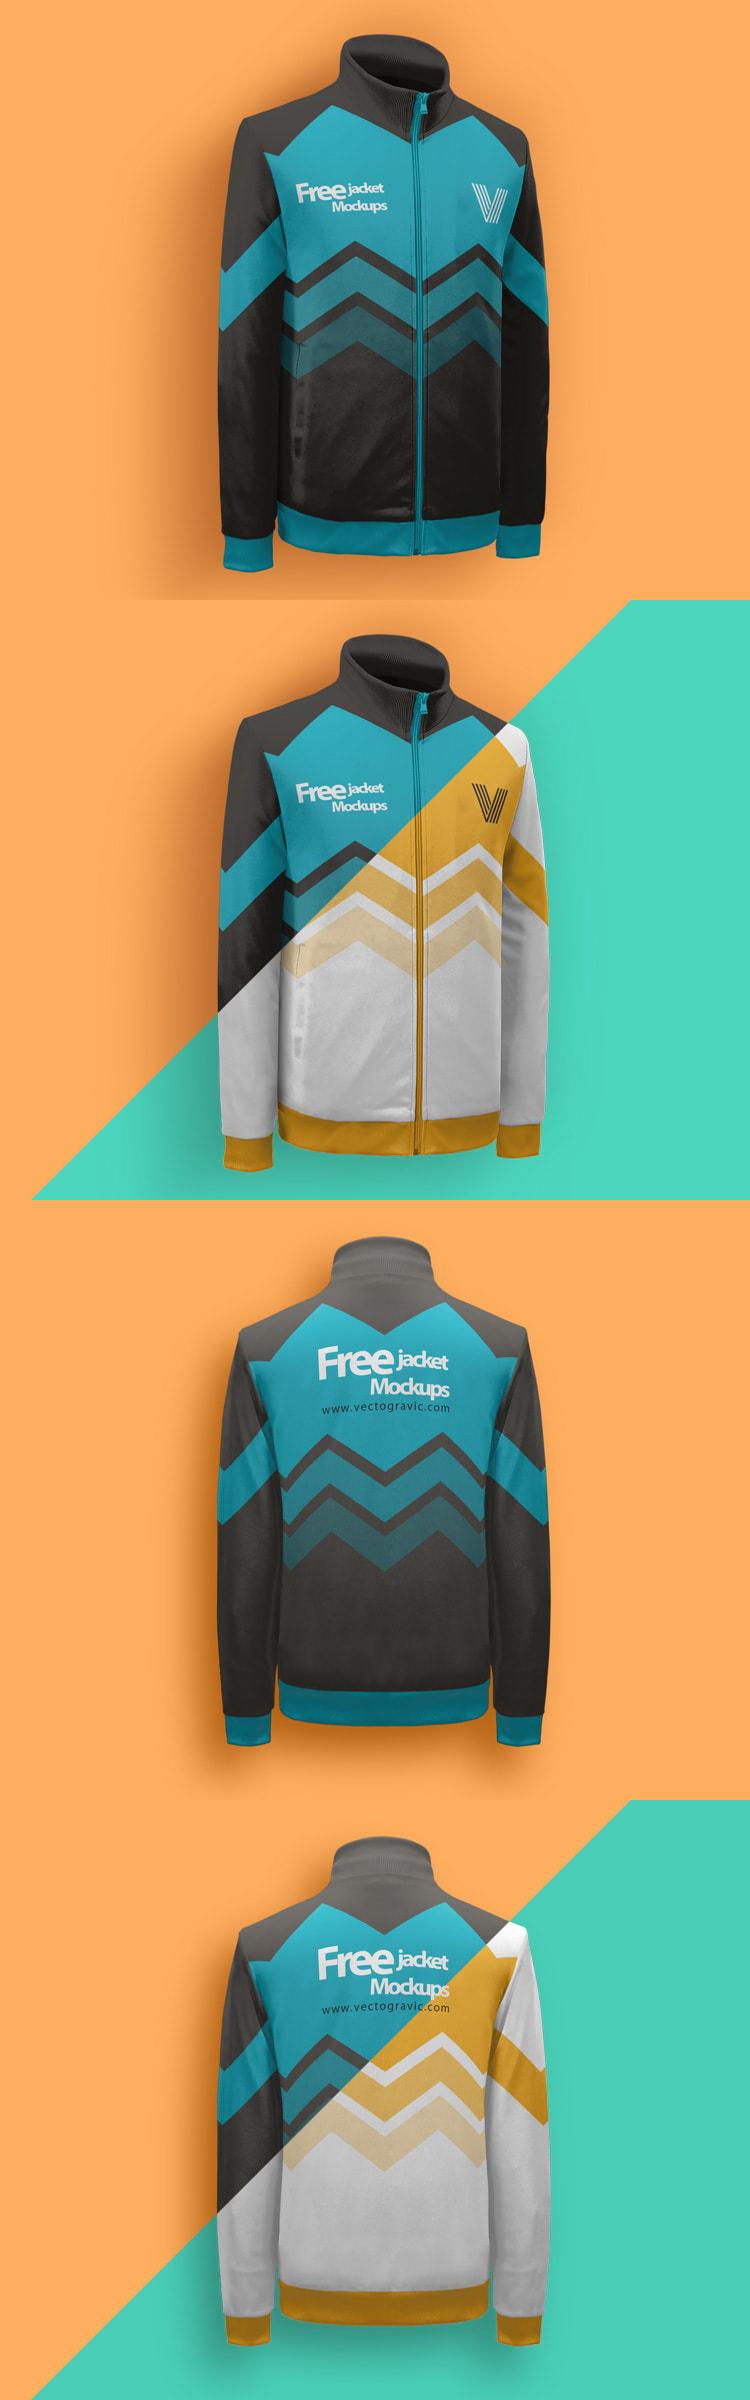 Download Free Download Jacket Mock Ups On Vectogravic Design Clothing Mockup Mockup Free Mockup